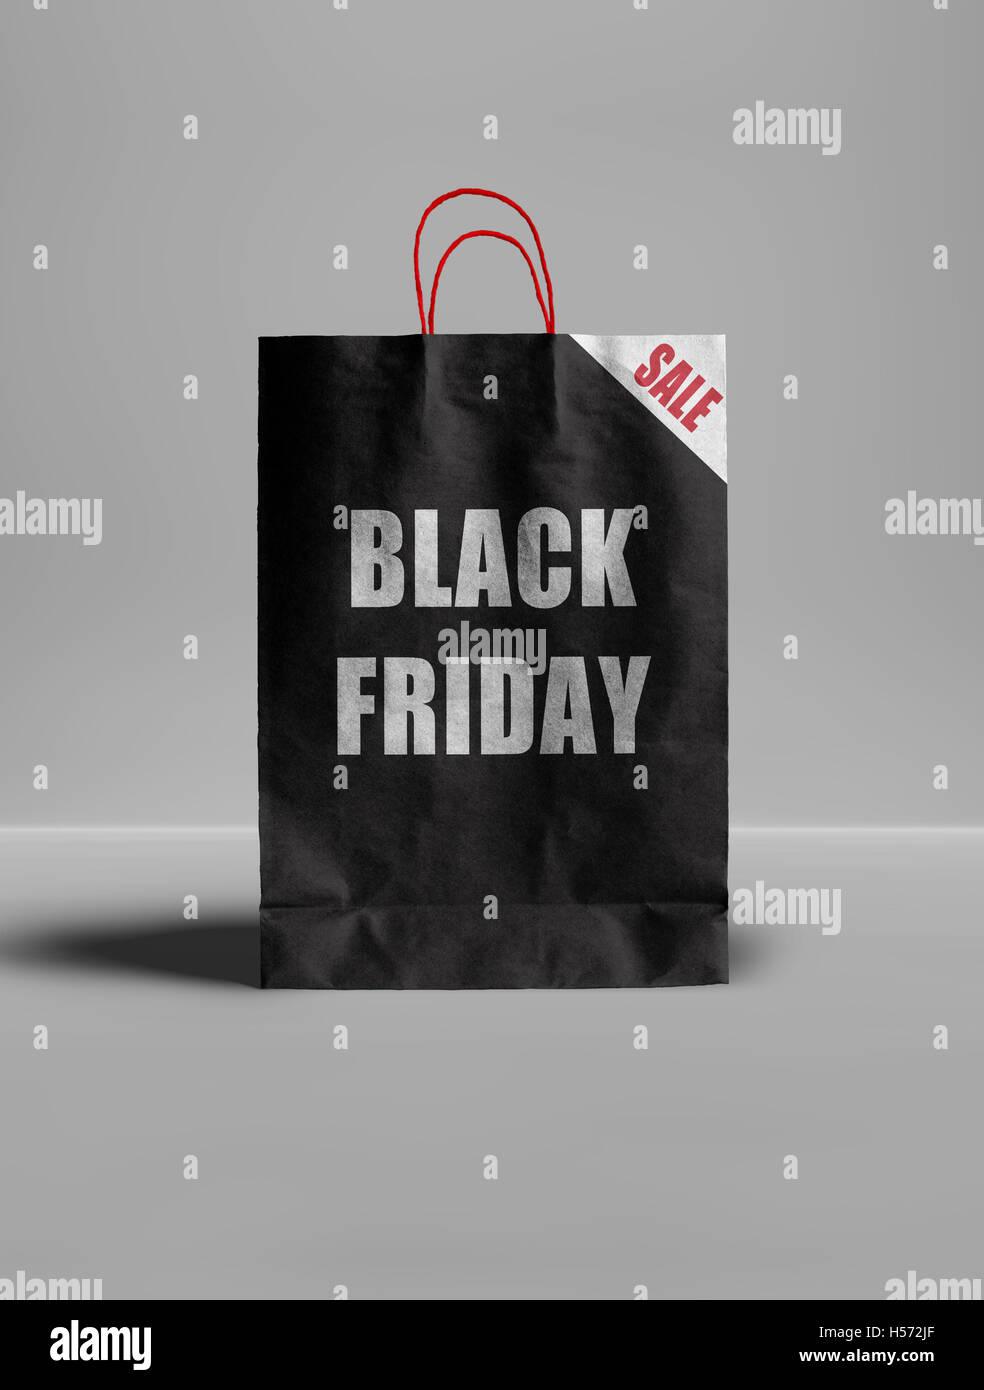 Black Friday paper bag. - Stock Image